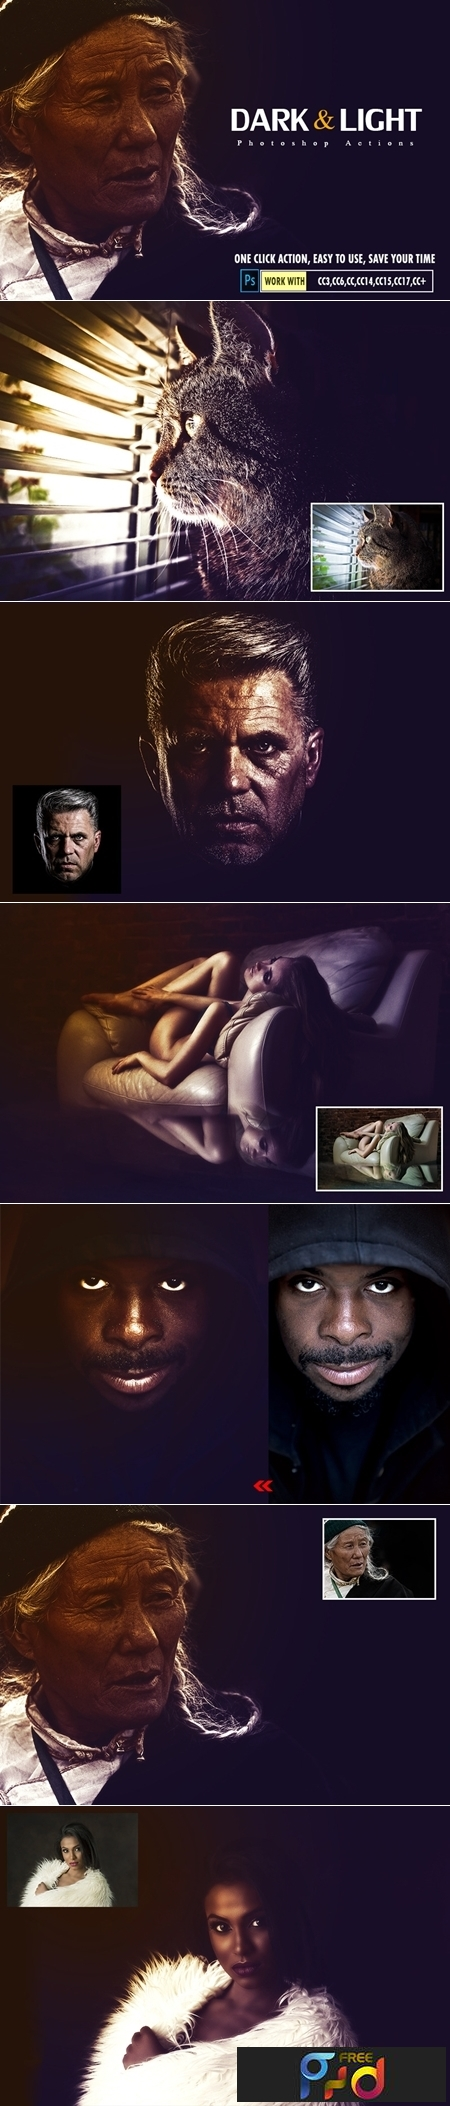 Dark & Light Photoshop Actions 3553198 1